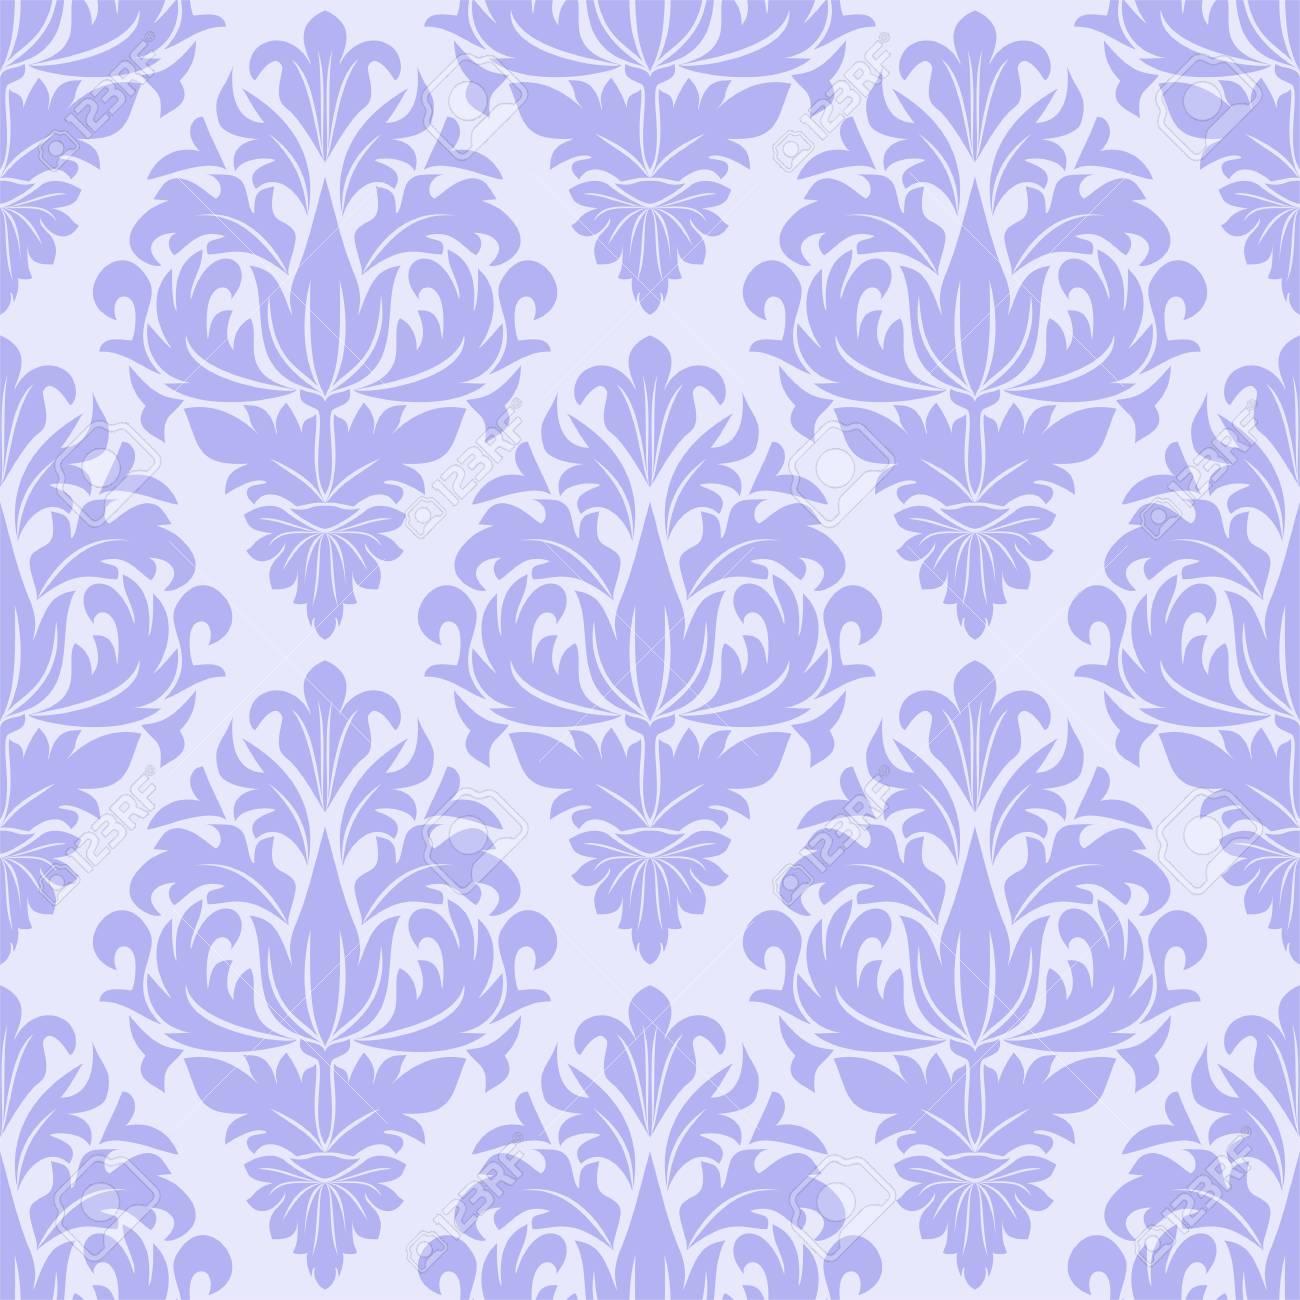 Seamless blue ornamental Pattern for Design - 97509673